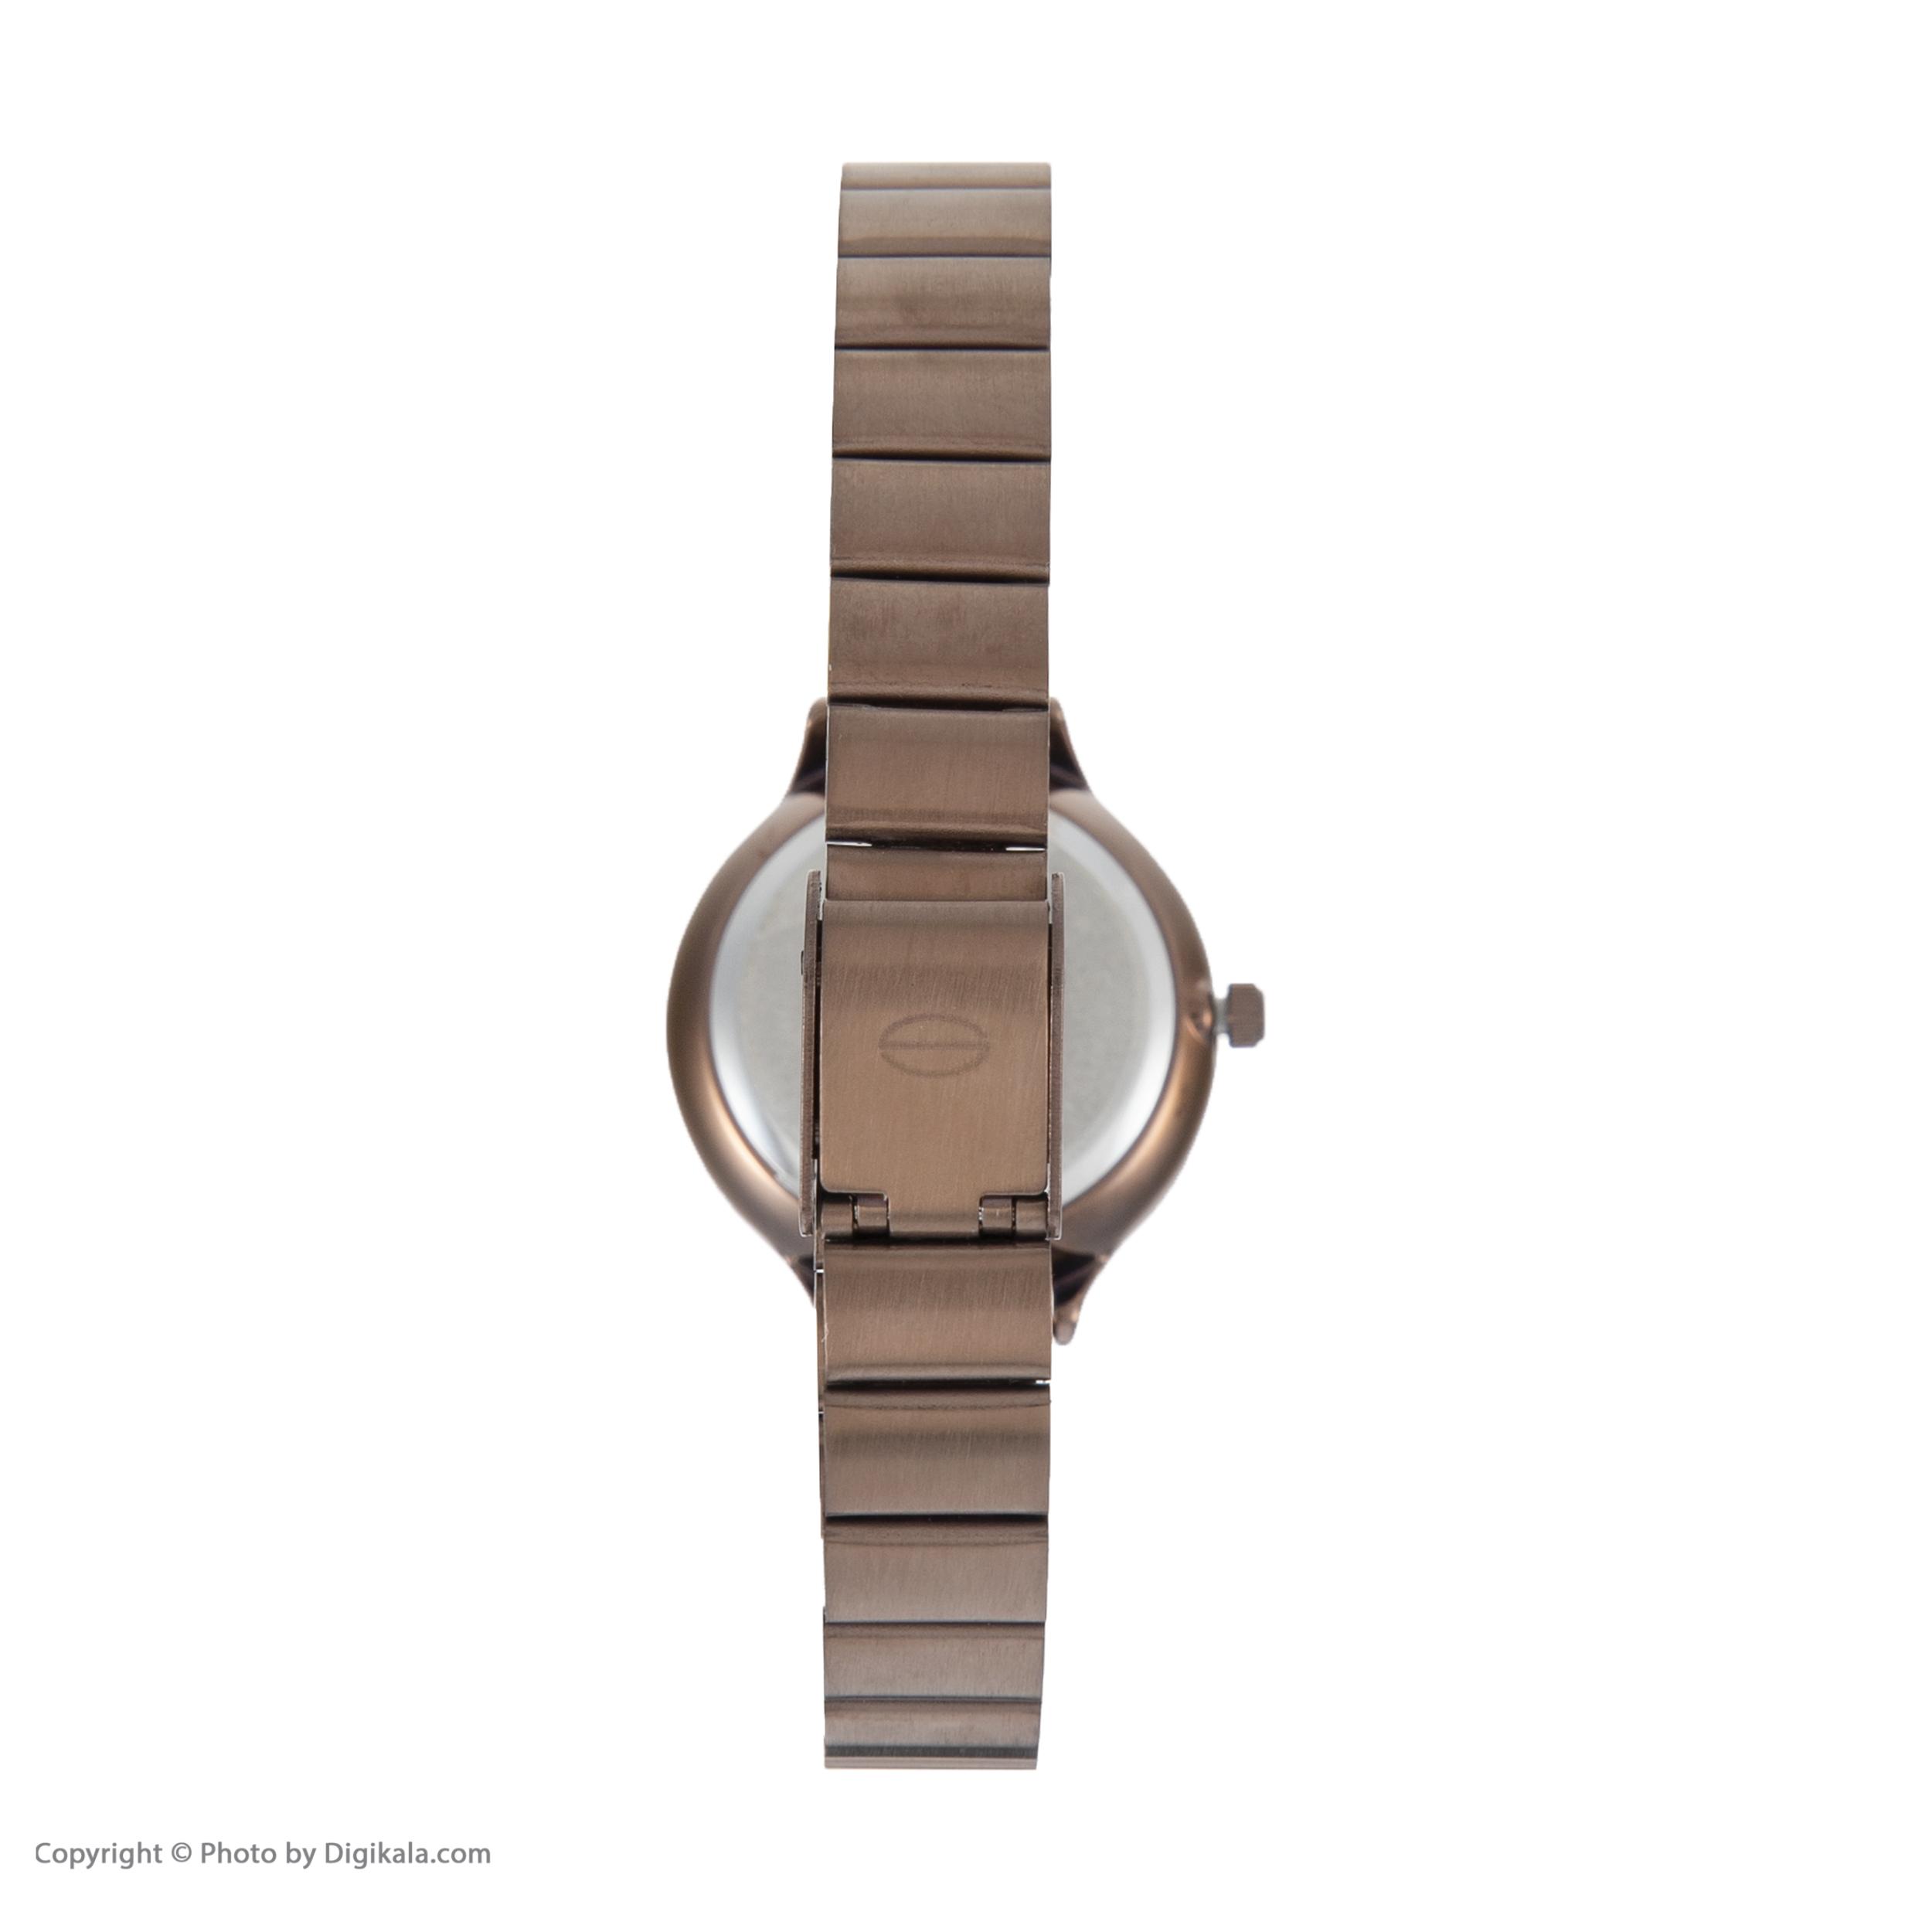 ساعت  زنانه سولیدا مدل 04 کد S1116L